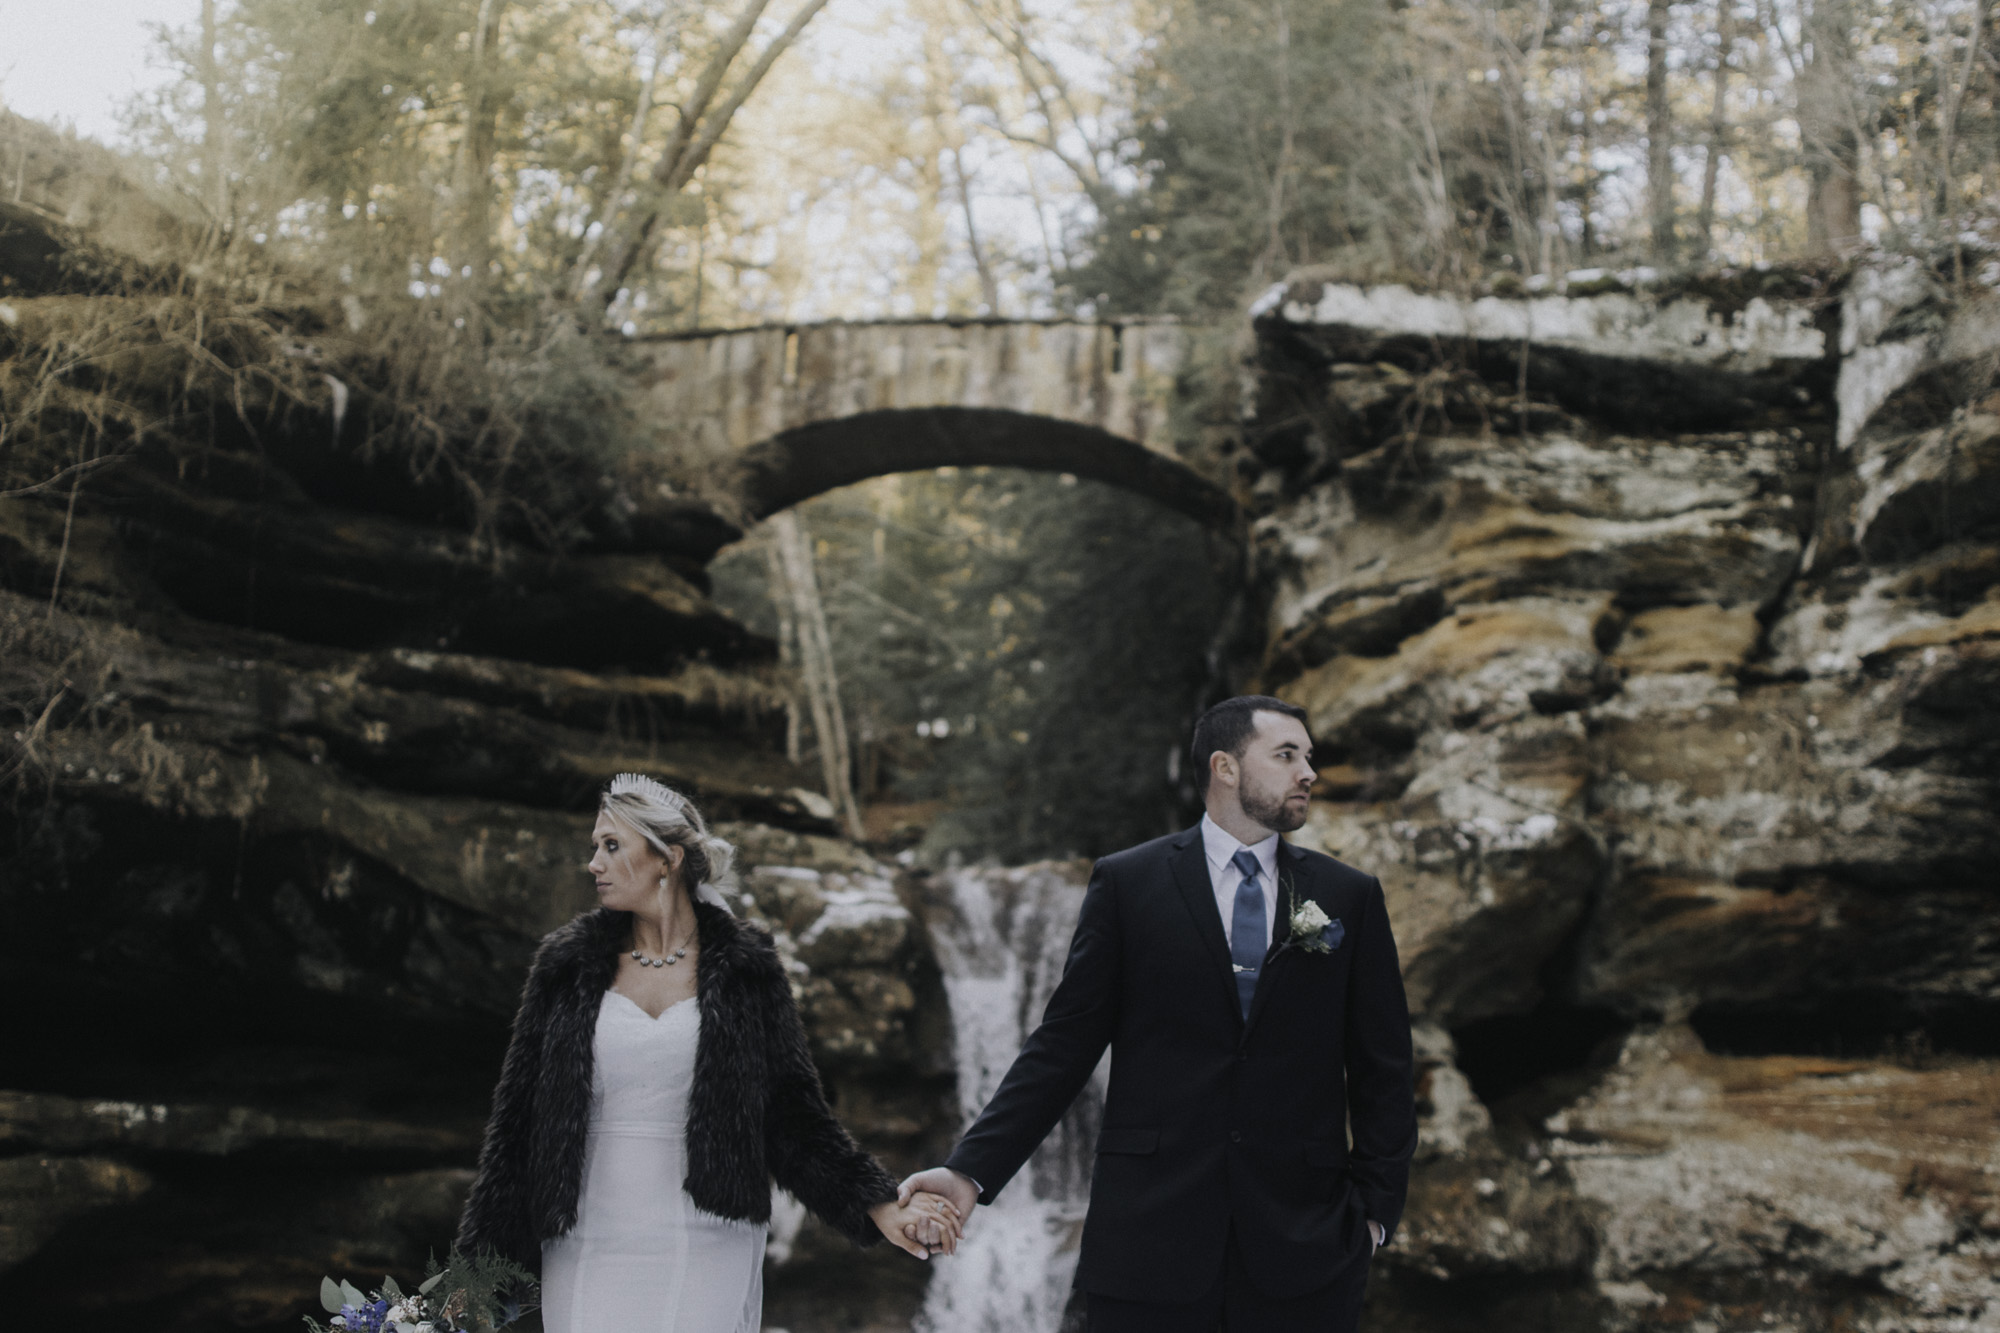 Cate_Ann_Photography_Dayton_Ohio_Wedding_Elopement_And_Engagement_PhotographerDSC_6118-2.jpg